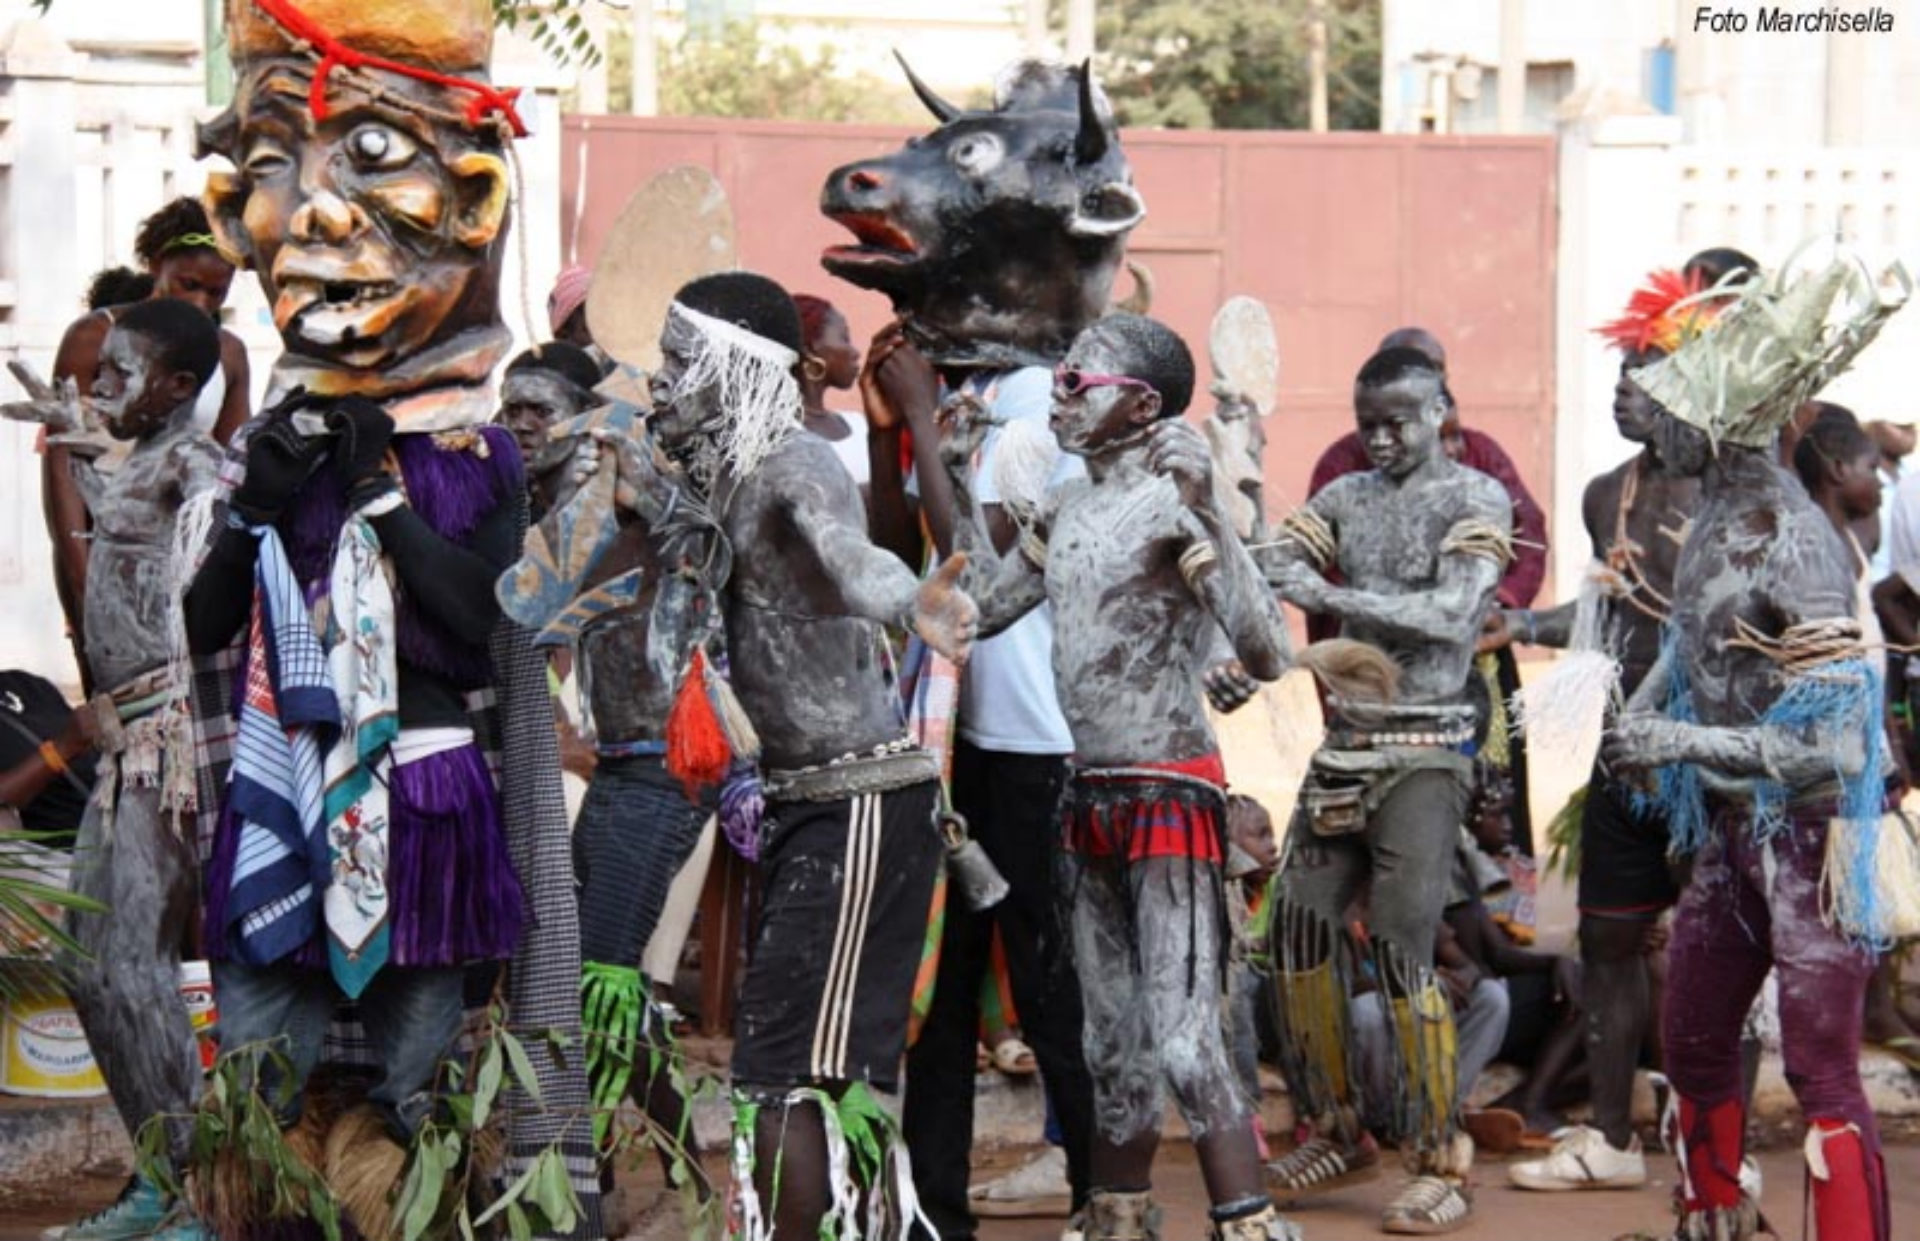 Tribal Carneval, sfilata, Guinea-Bissau, Eventrip carnevale guinea bissau